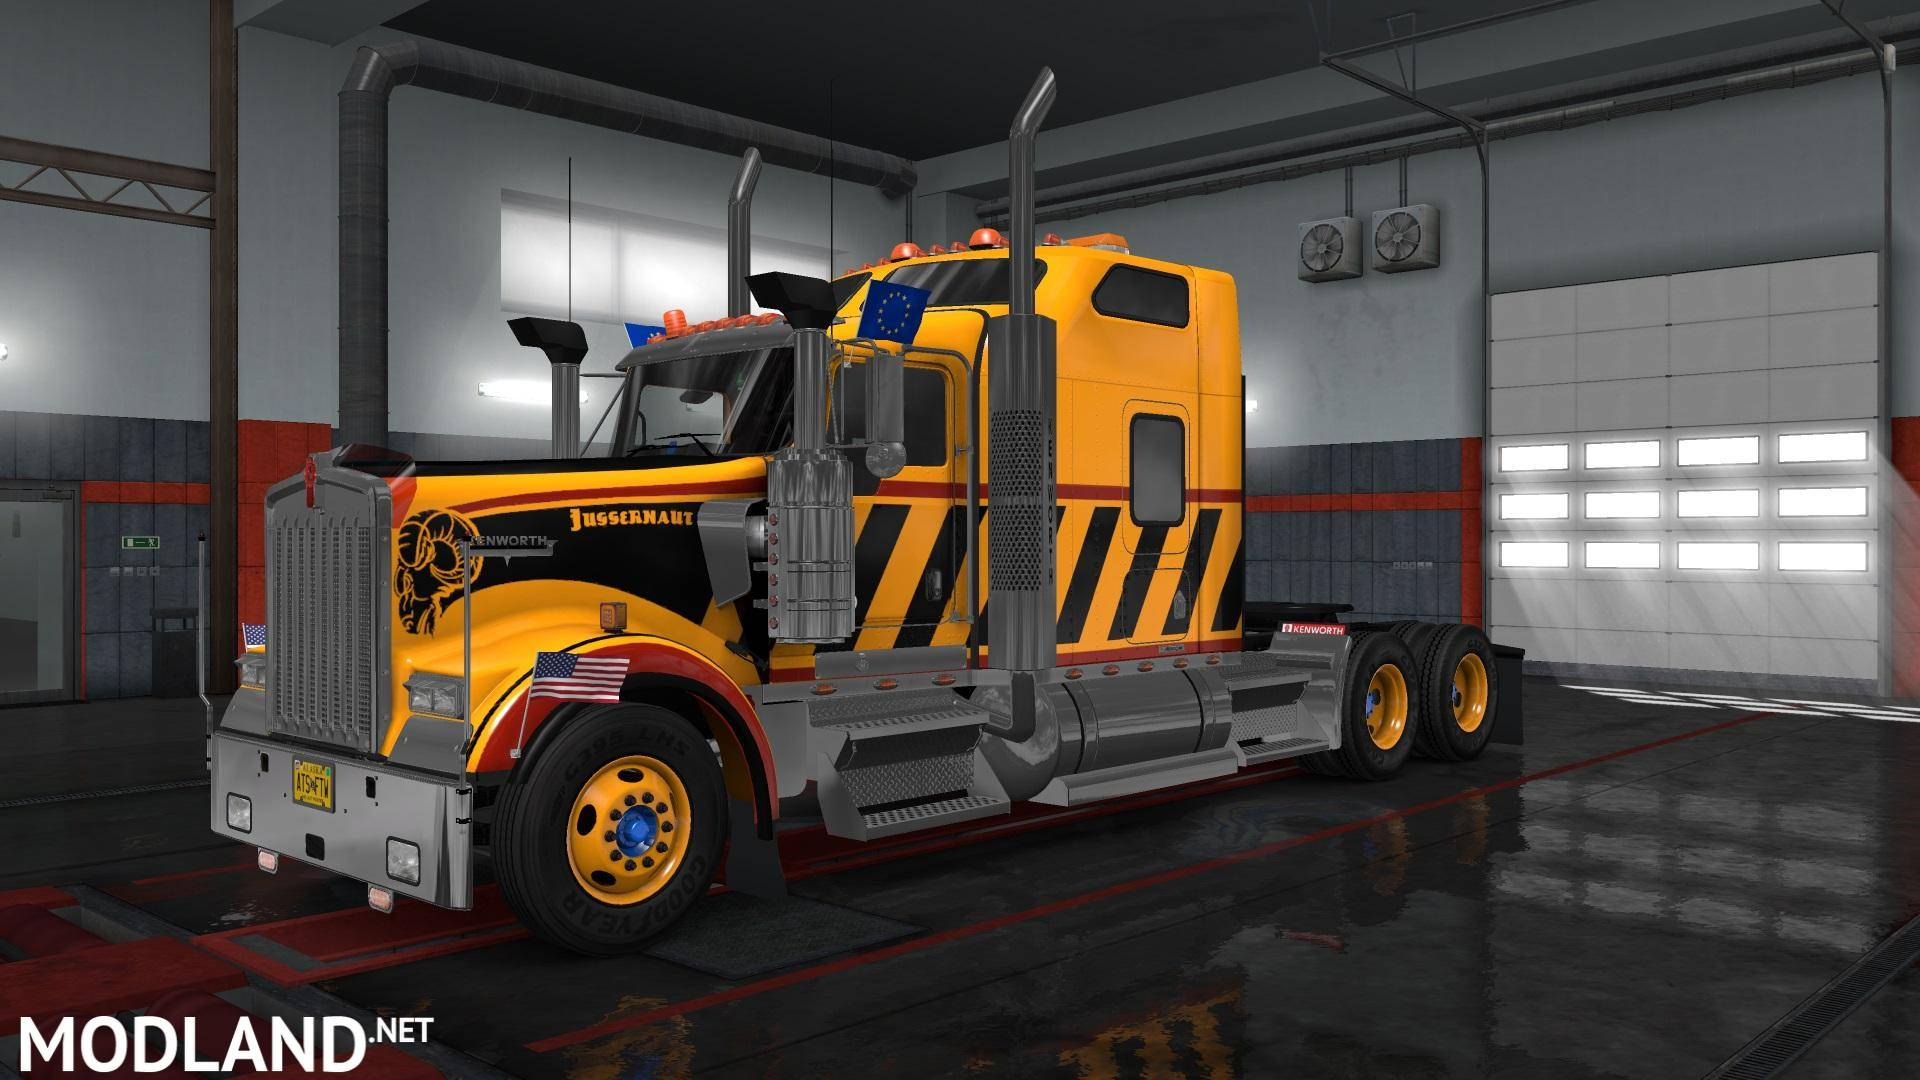 American Truck Pack - New Premium Edition (1 31, 1 32) mod